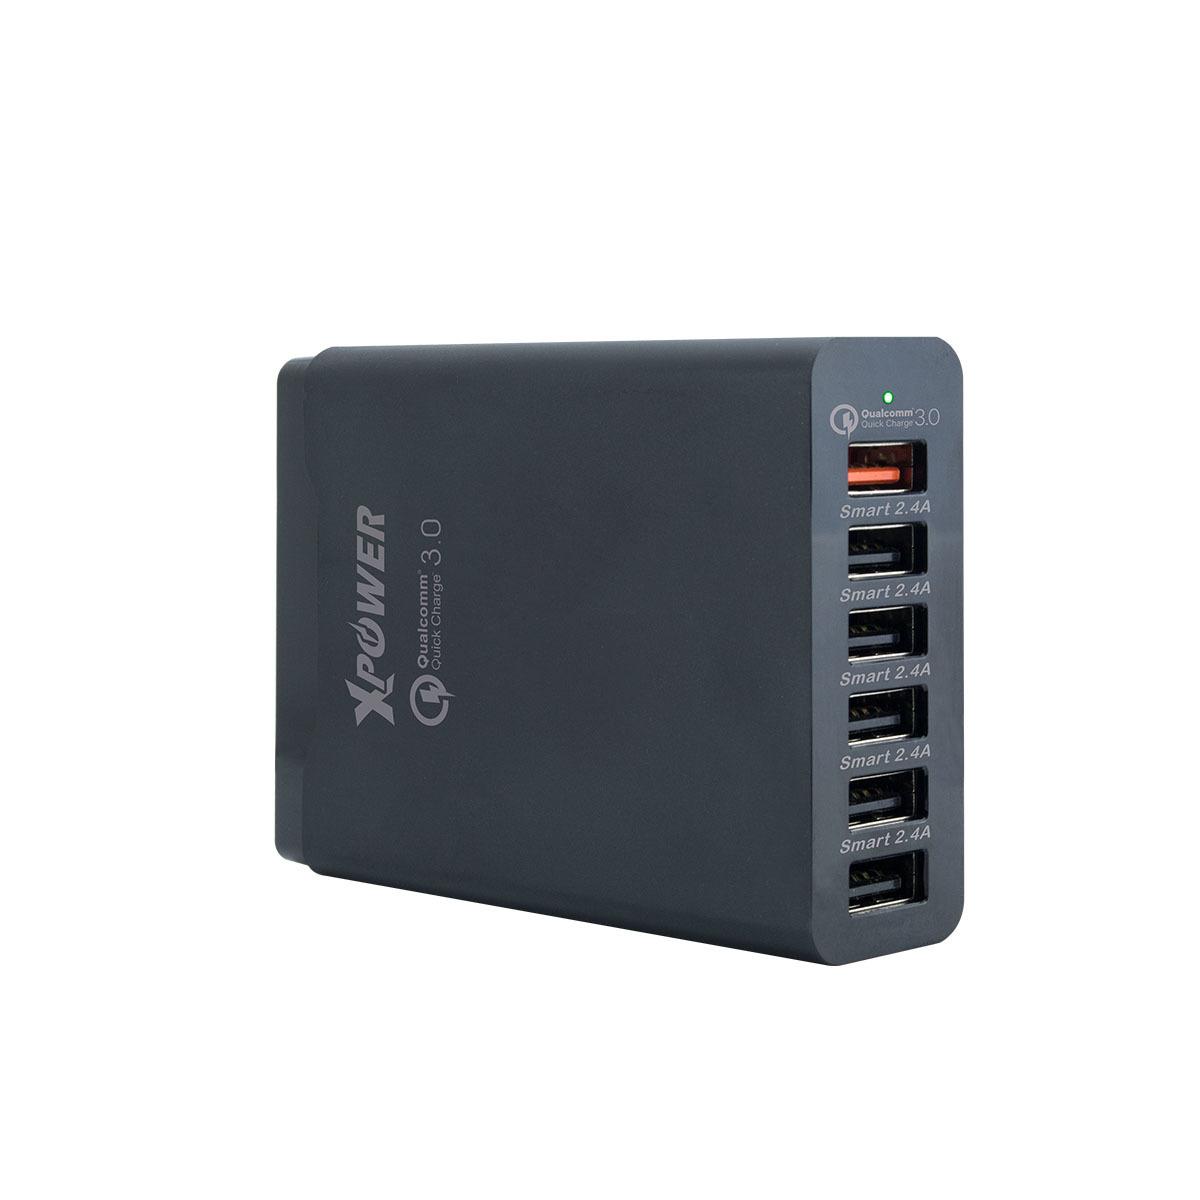 DC6Q+ 快充3.0 智能充電器 [全新改良版]